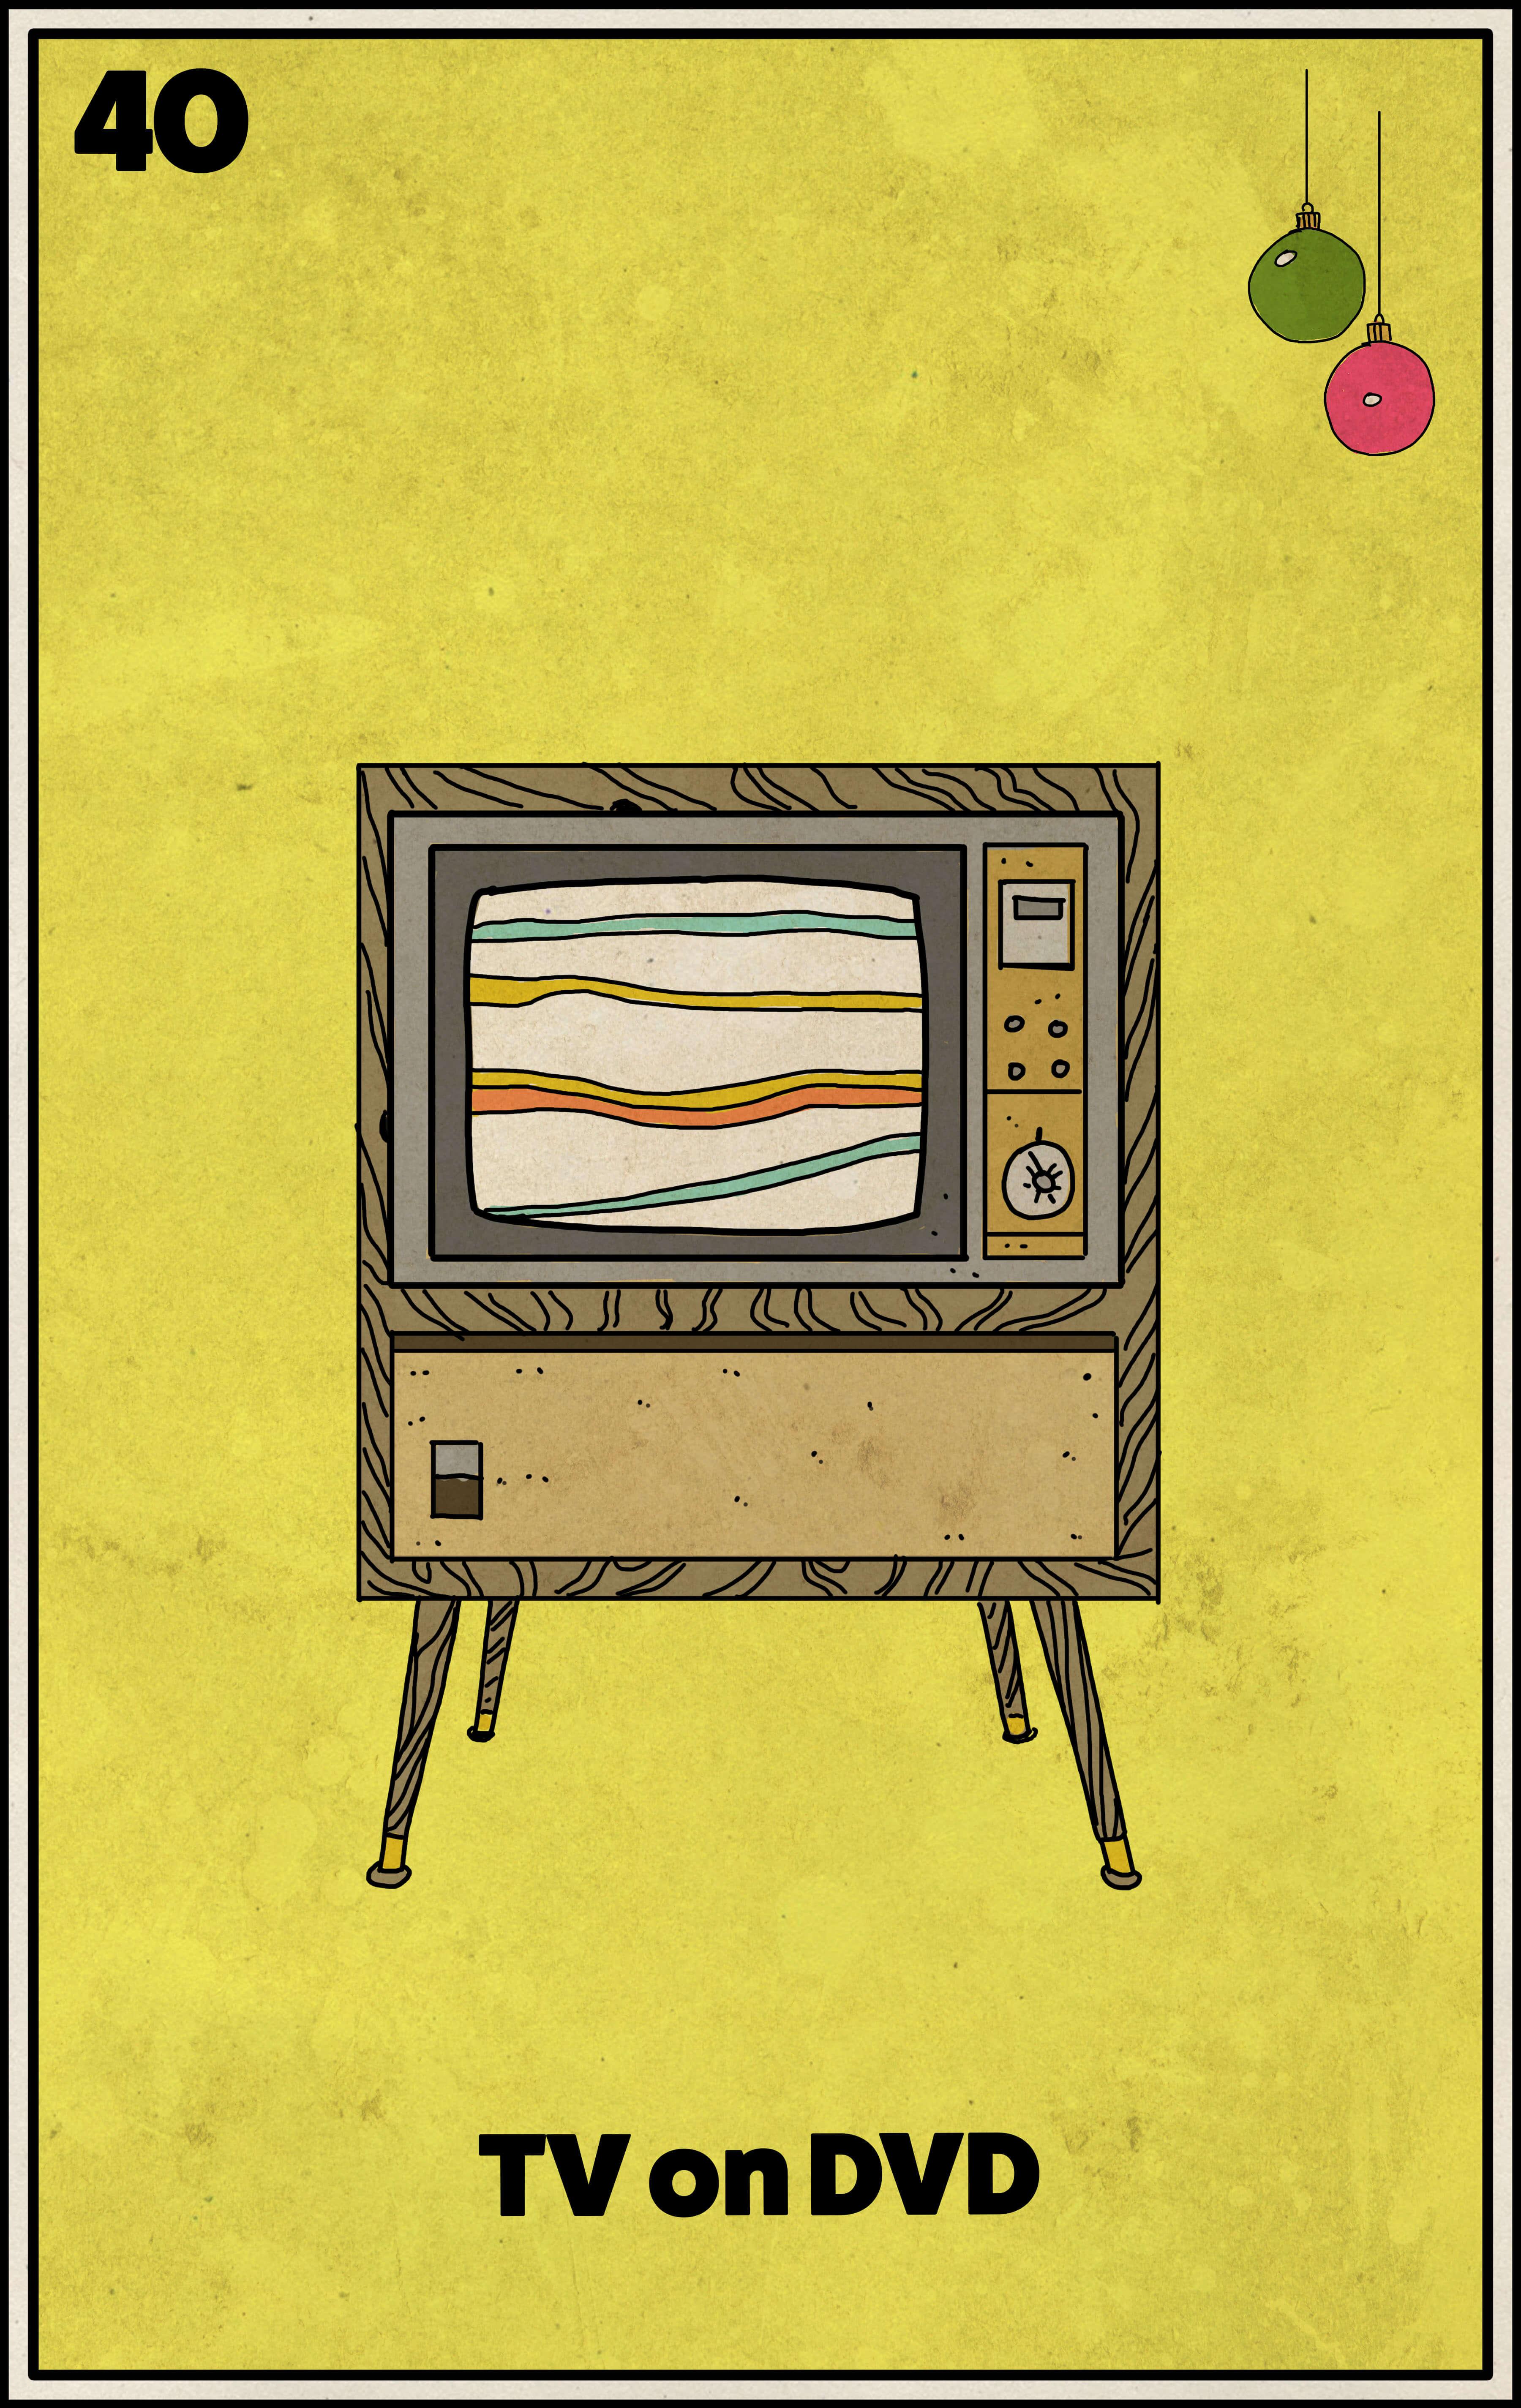 TV on DVD